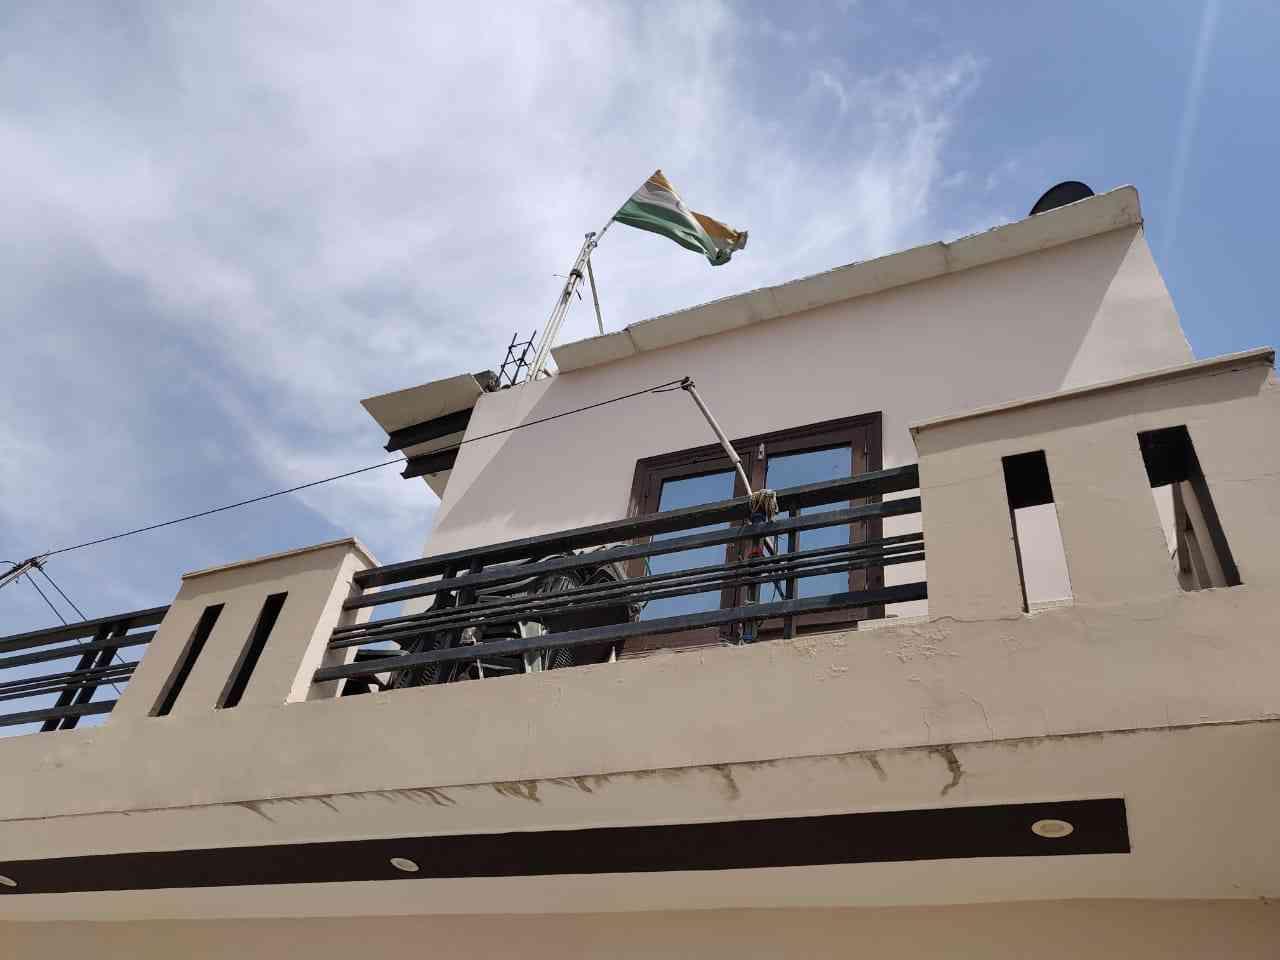 The Indian flag flies atop the family's home. Photo credit: Sandeep Yadav